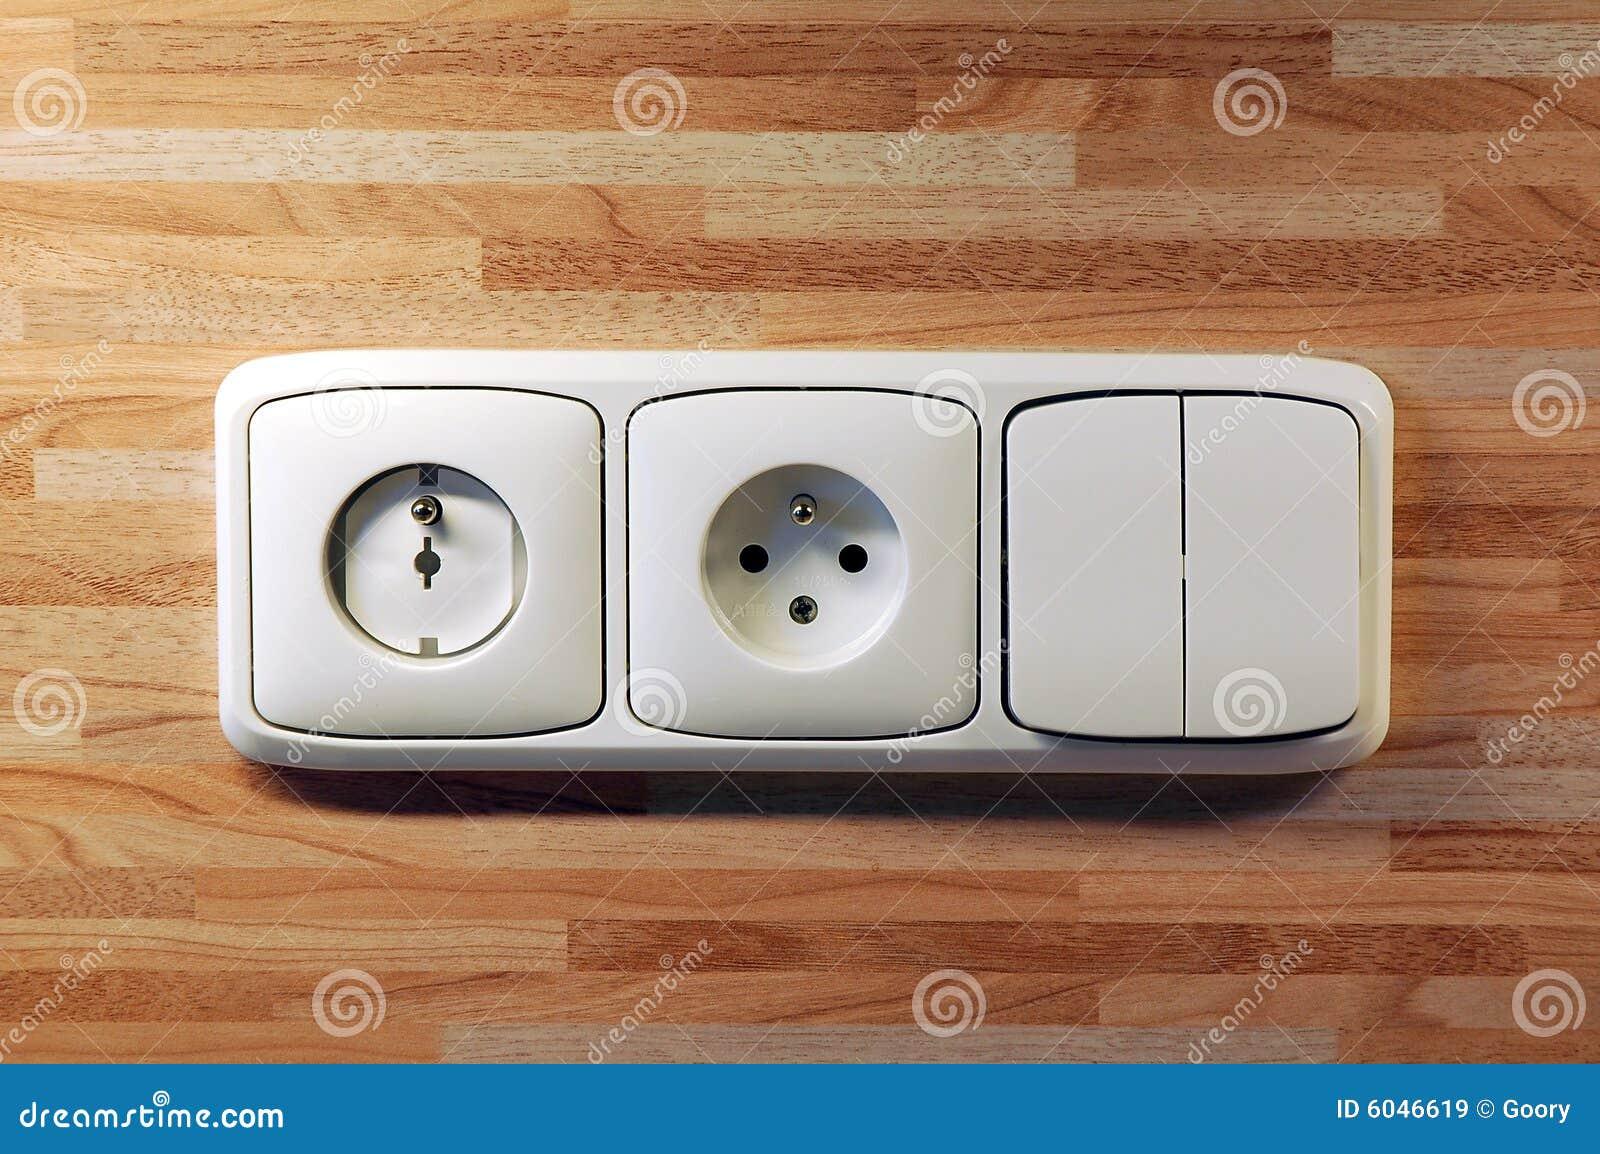 Enchufes e interruptores im genes de archivo libres de - Enchufes e interruptores ...